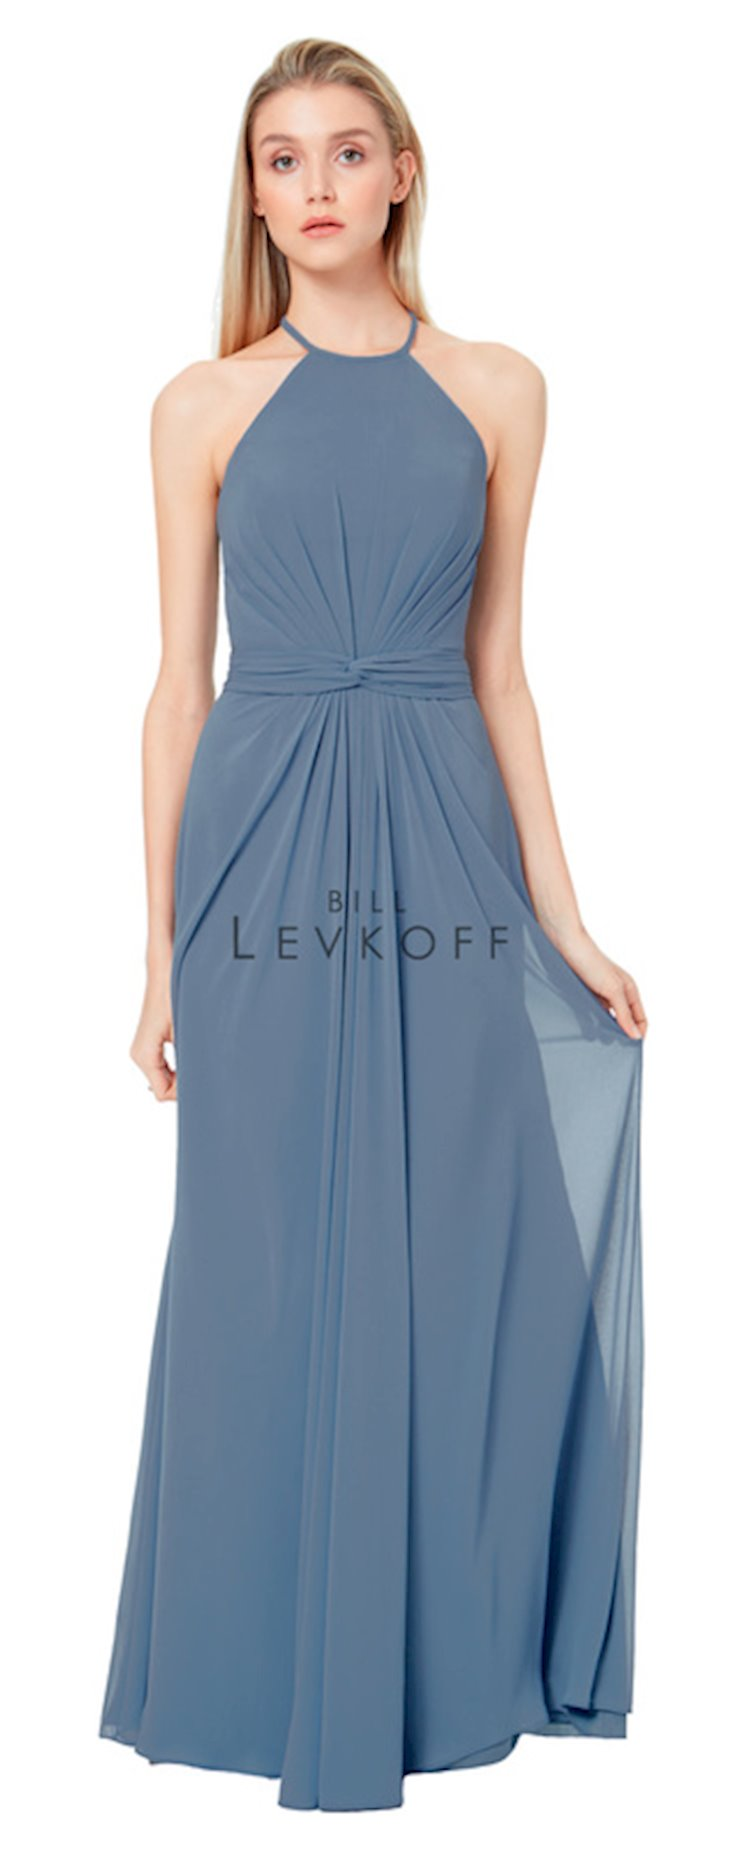 Bill Levkoff Style #1507